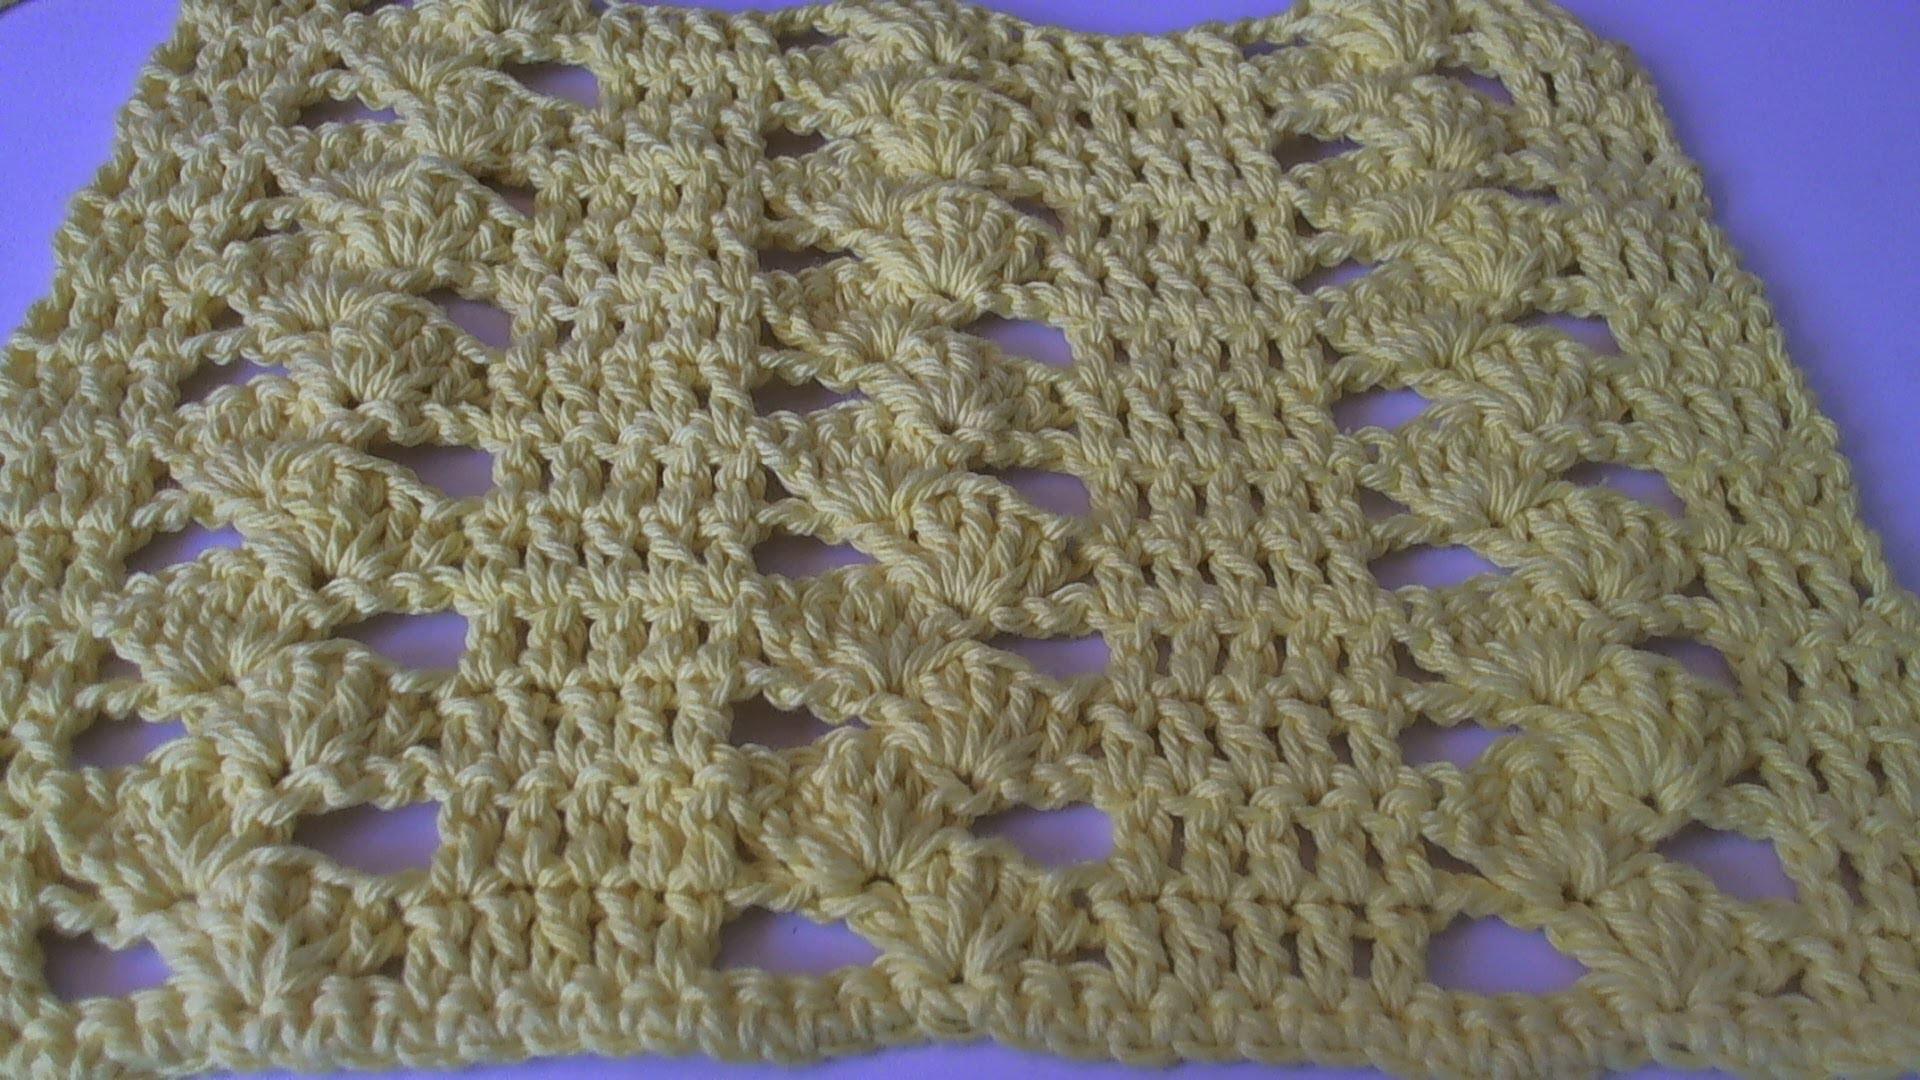 How to crochet a dishcloth - Drunk clusters design. Tambien en espanol